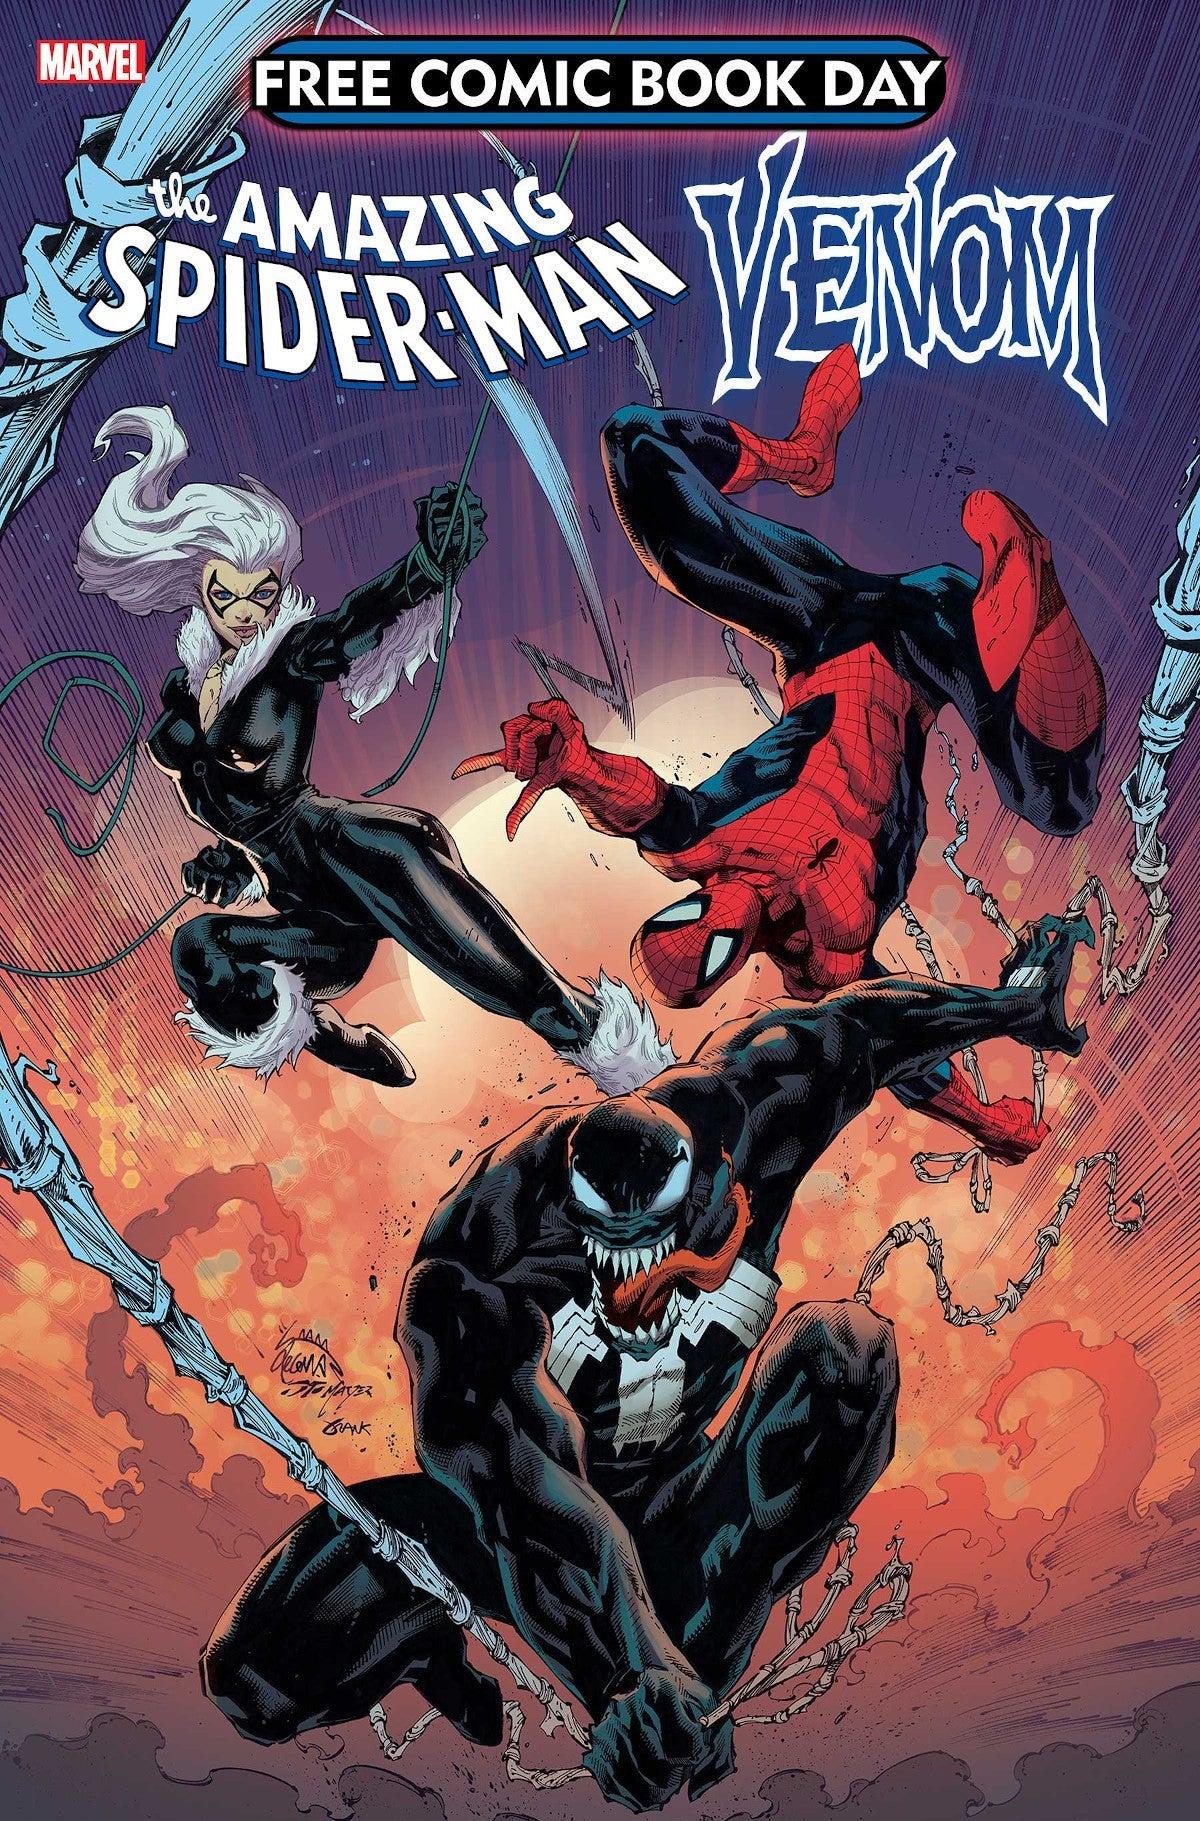 Free Comic Book Day Spider-Man Venom_2020